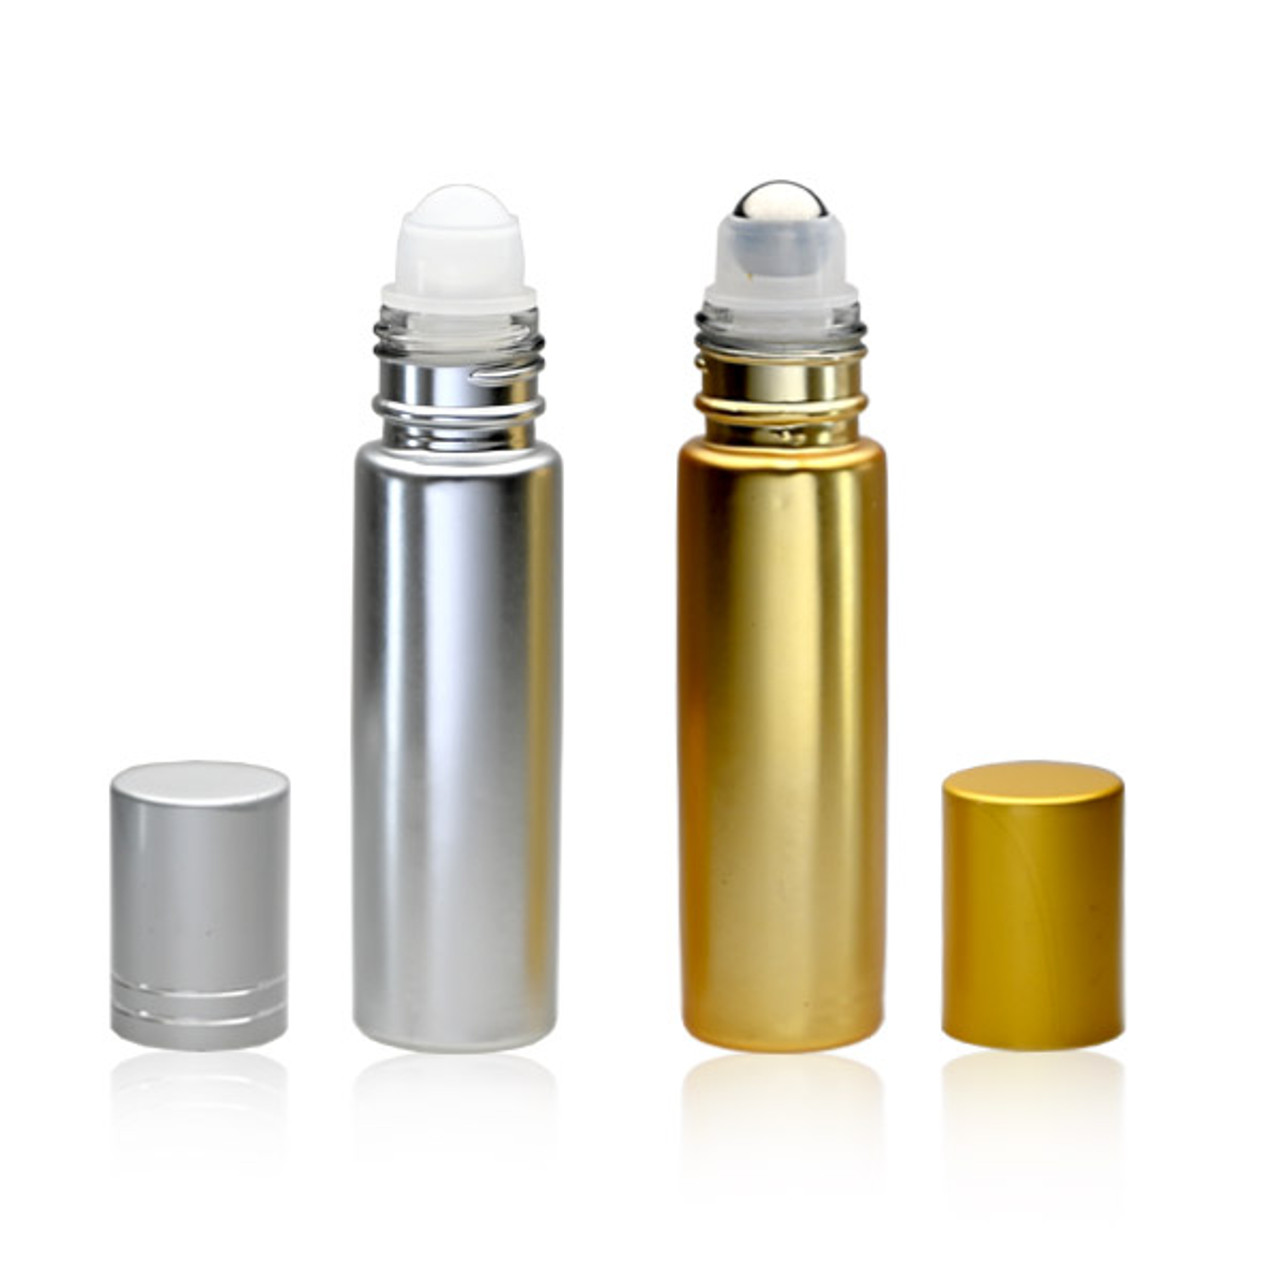 10 ml (1/3oz) Metallic Roll On Bottles W/Metallic Caps